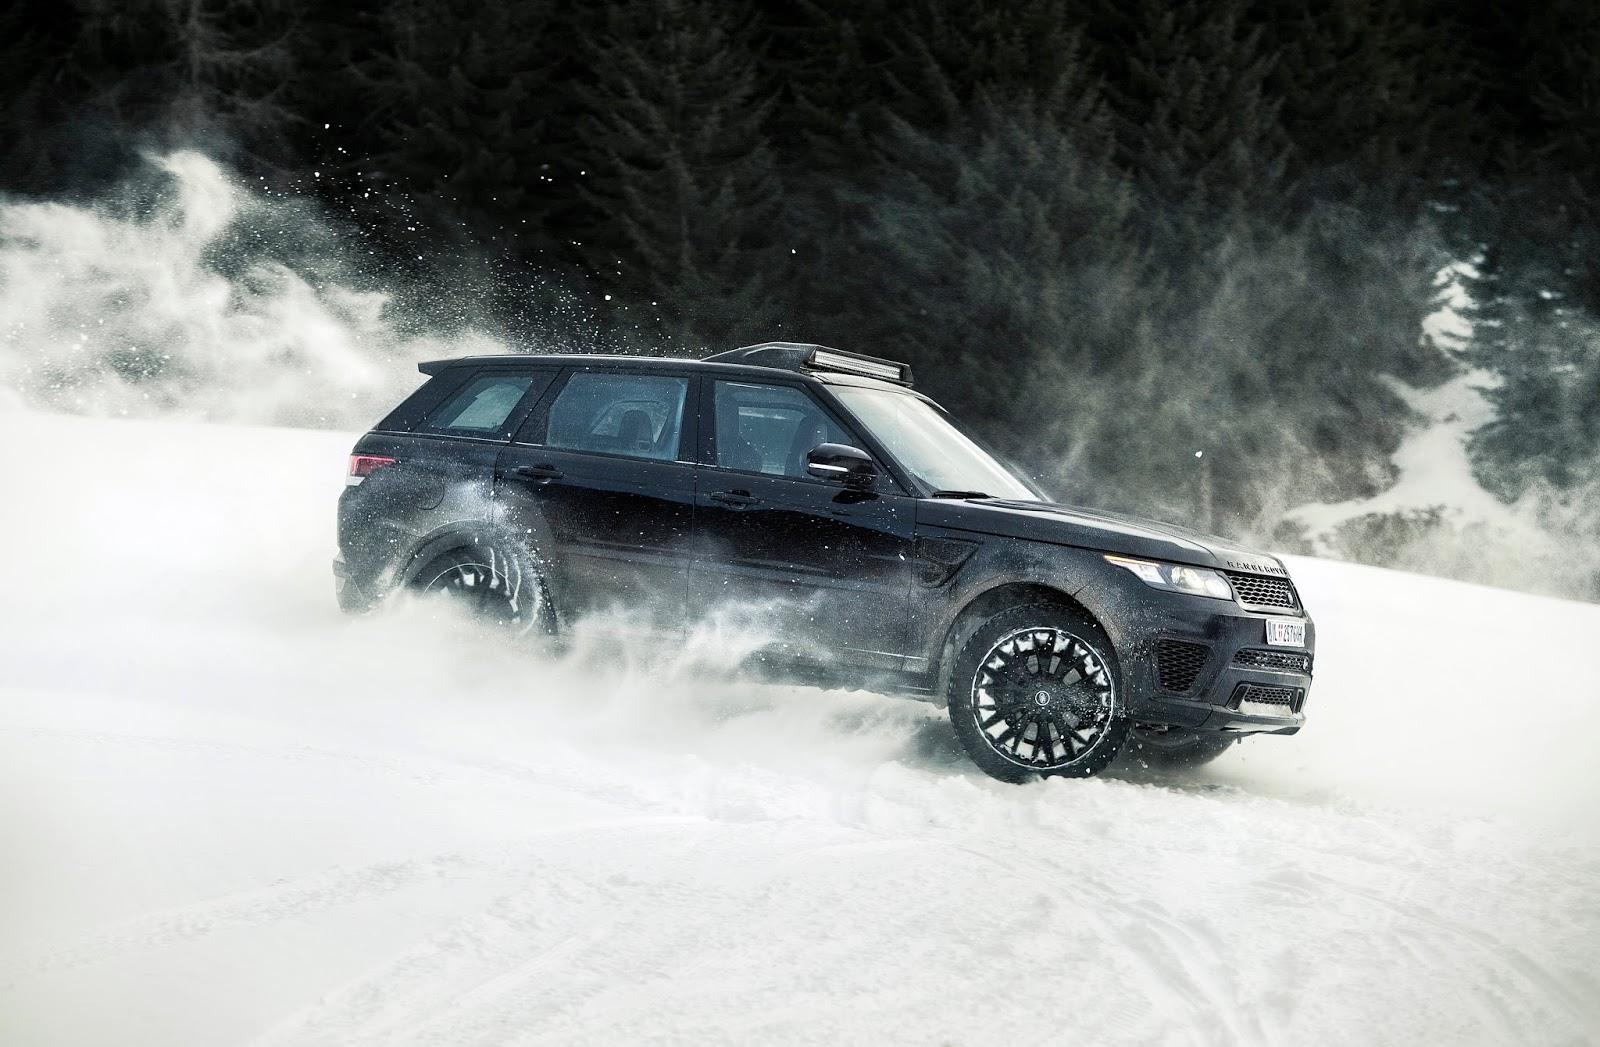 range rover sport svr 007 spectre Απονέμουμε τα Όσκαρ αυτοκινήτου Fun, Jaguar C-X75, LYKAN HYPERSPORT, movie cars, videos, zblog